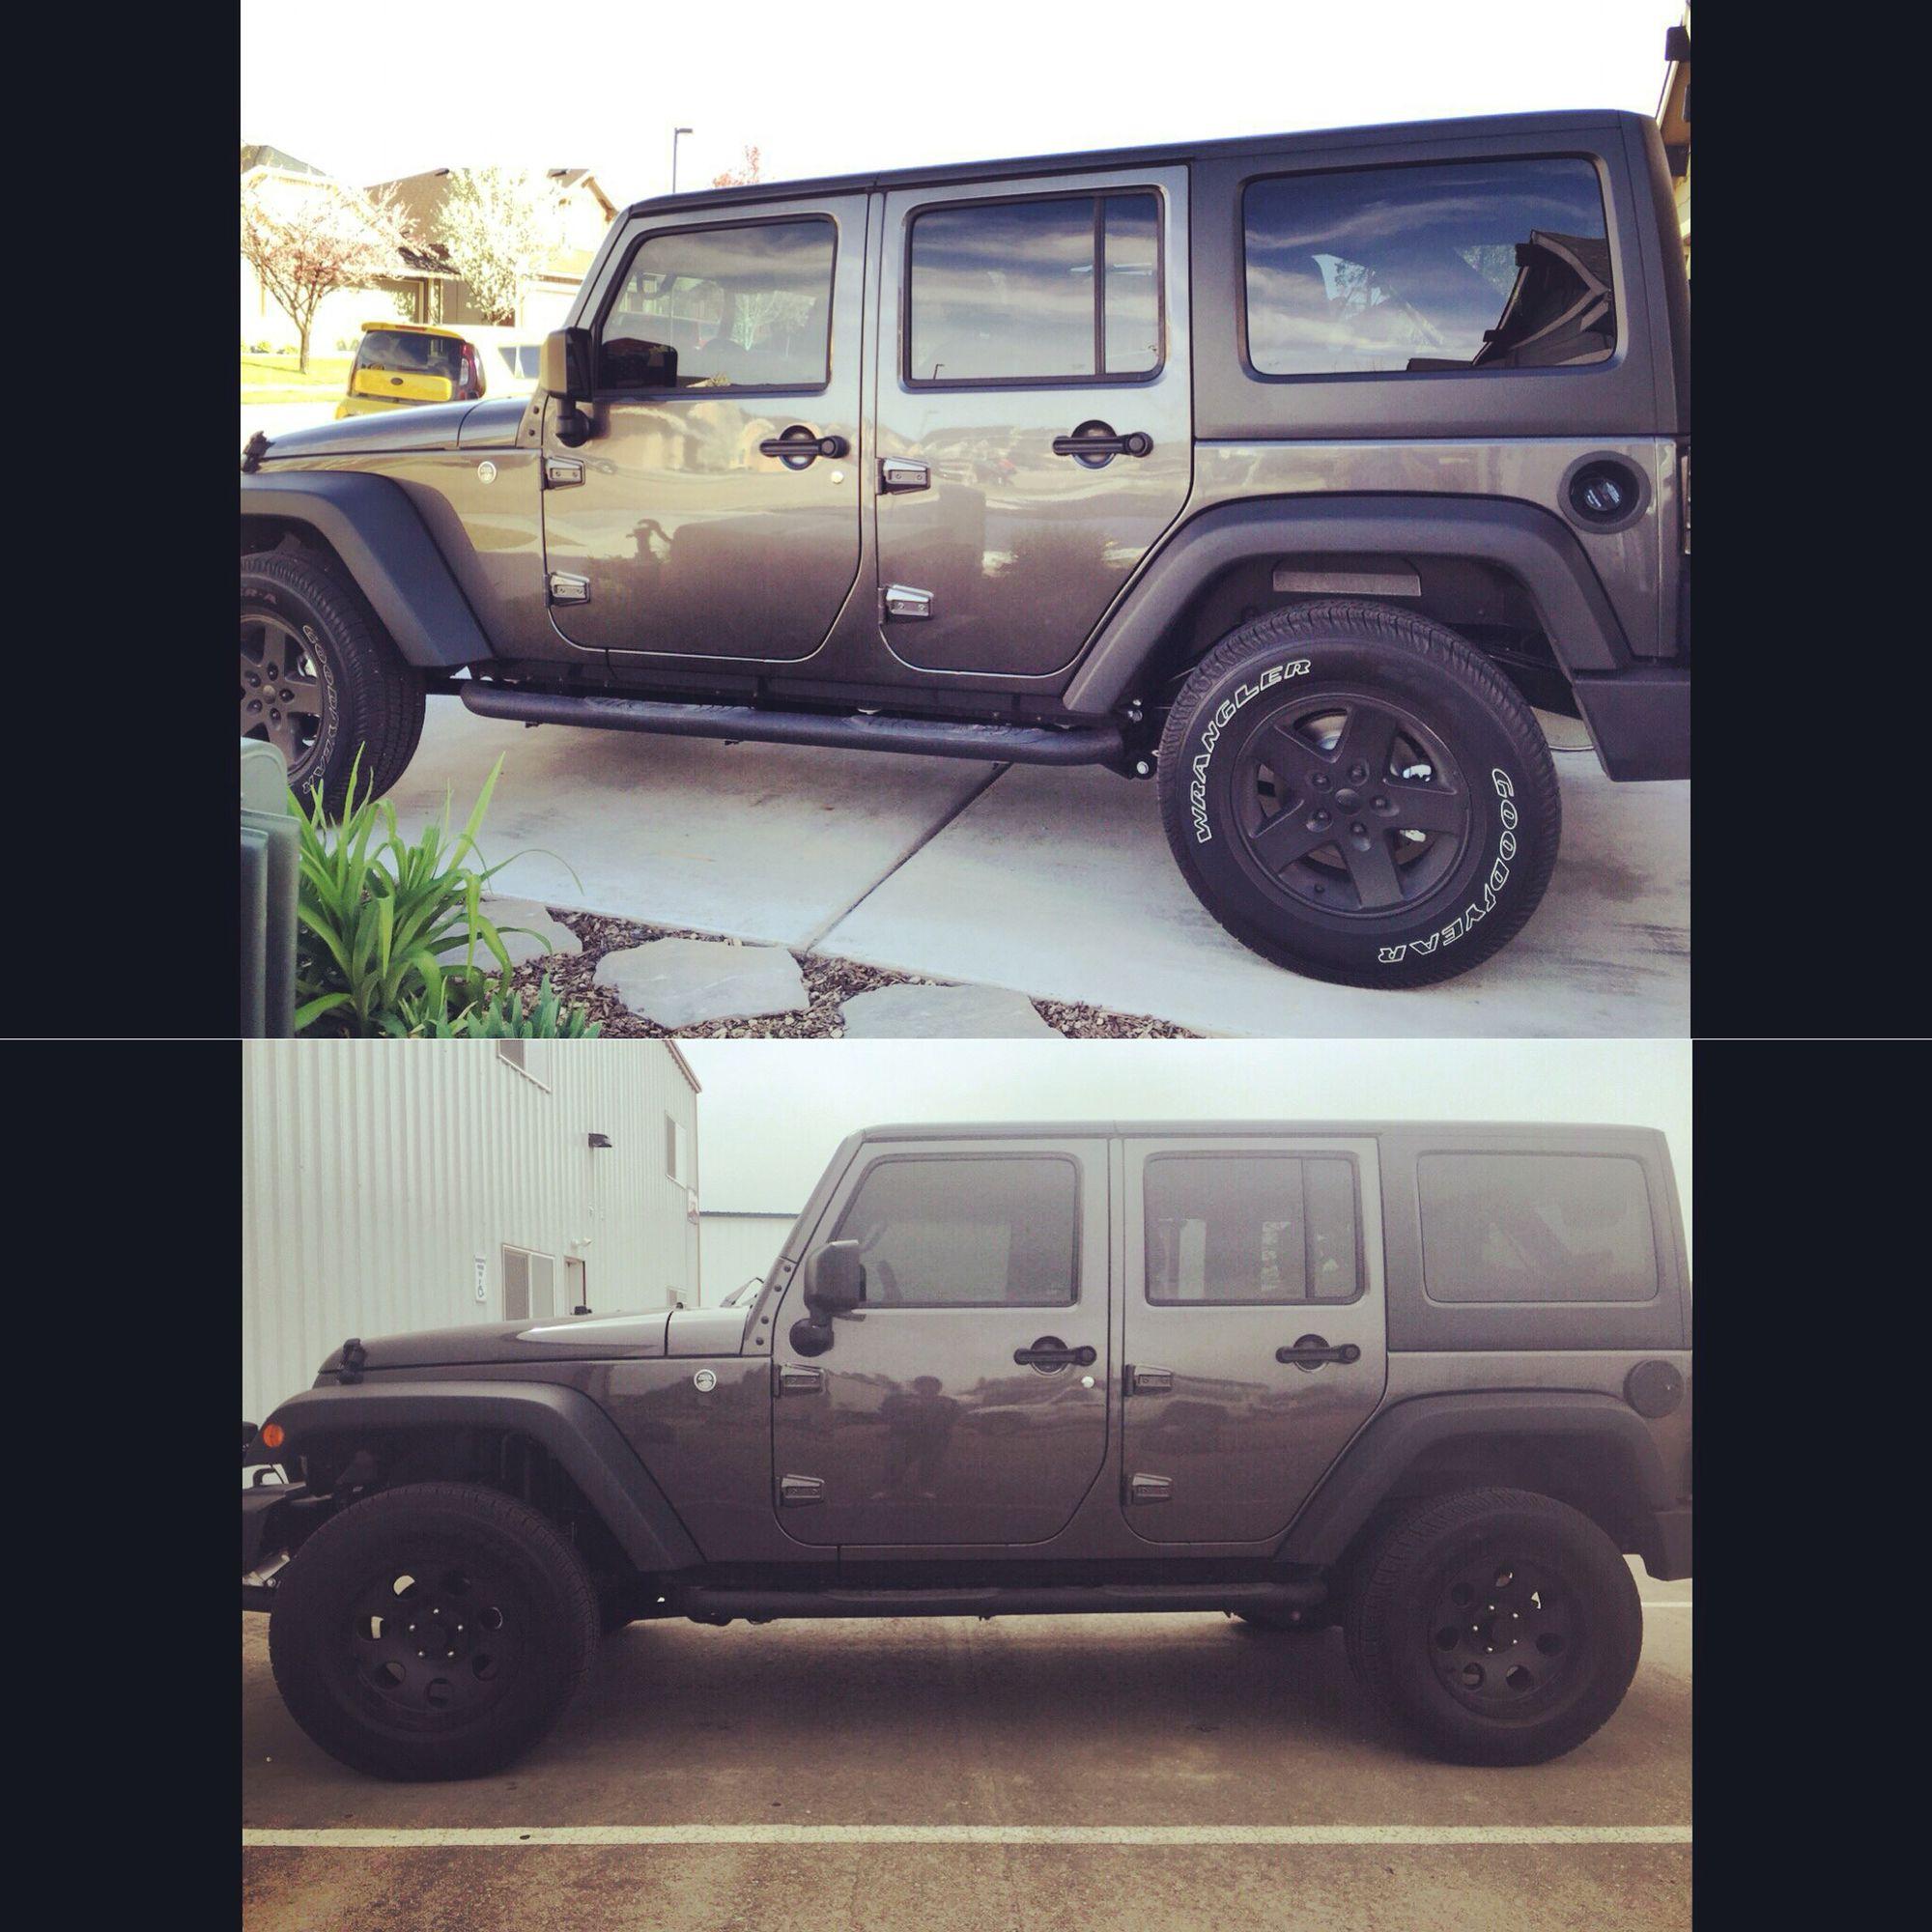 before and after 2 lift 35 tires on 2016 jeep wrangler jeeps pinterest jeeps. Black Bedroom Furniture Sets. Home Design Ideas